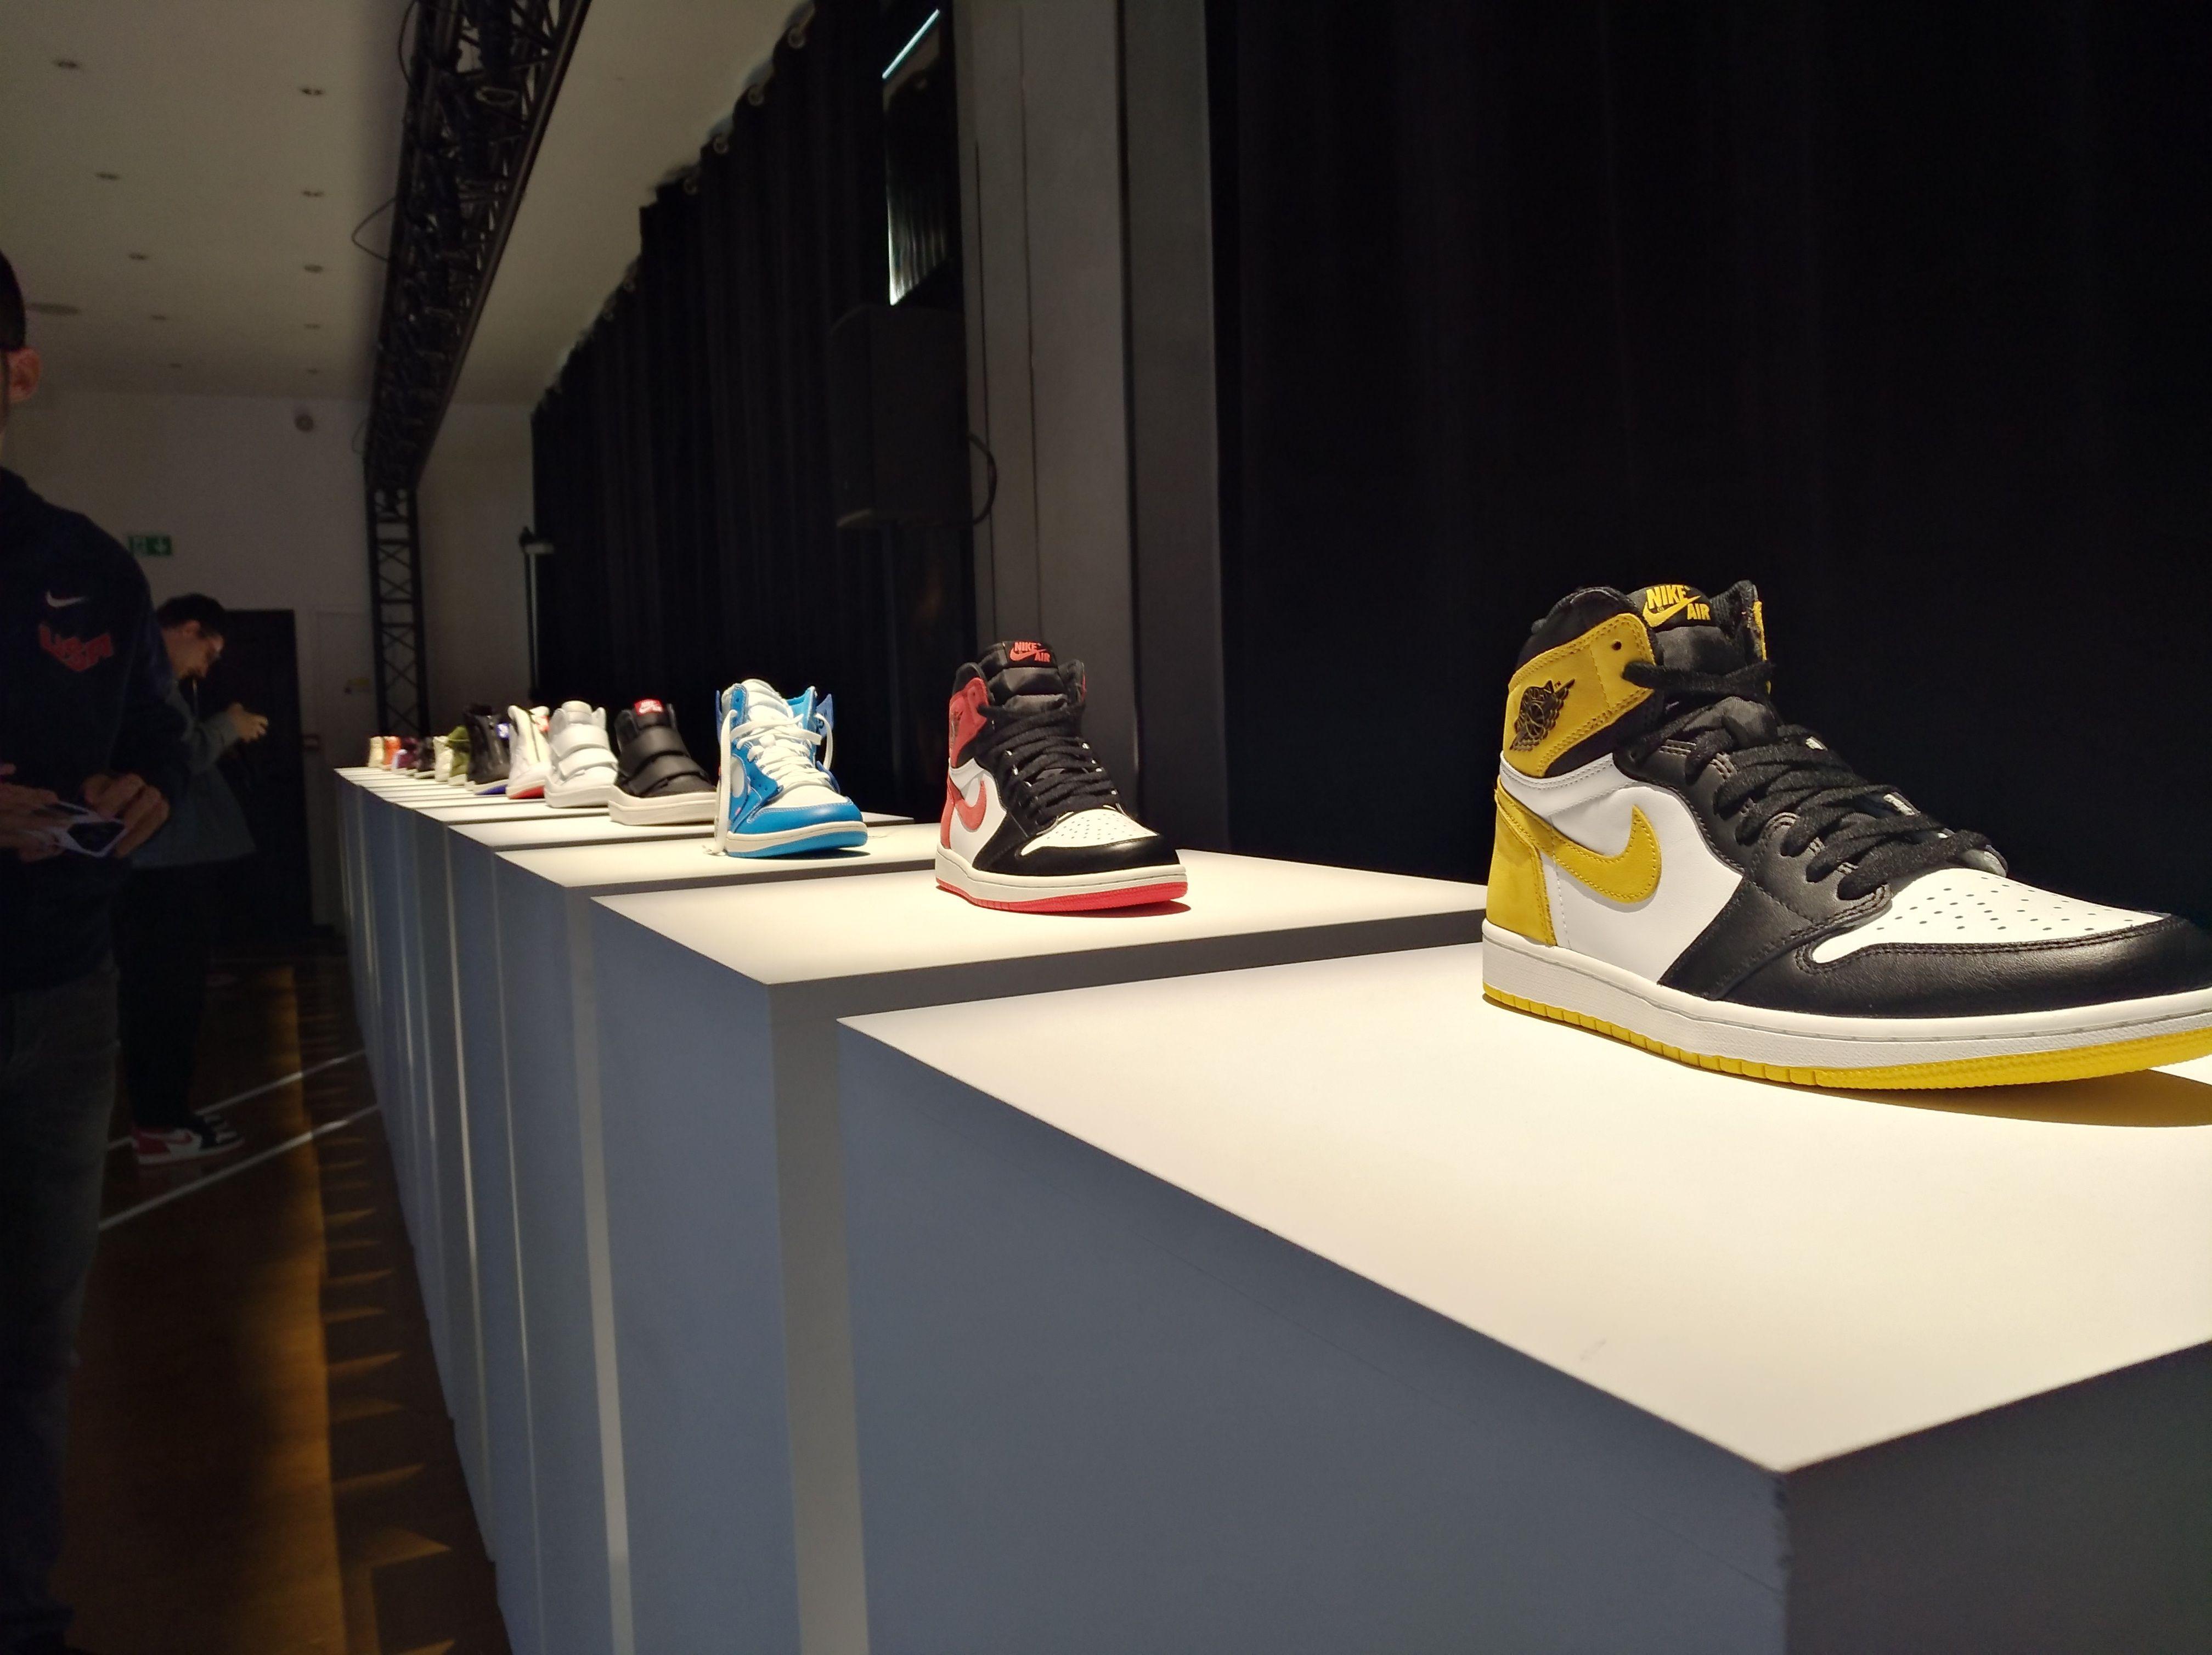 Si scrive Nike, si legge Jordan